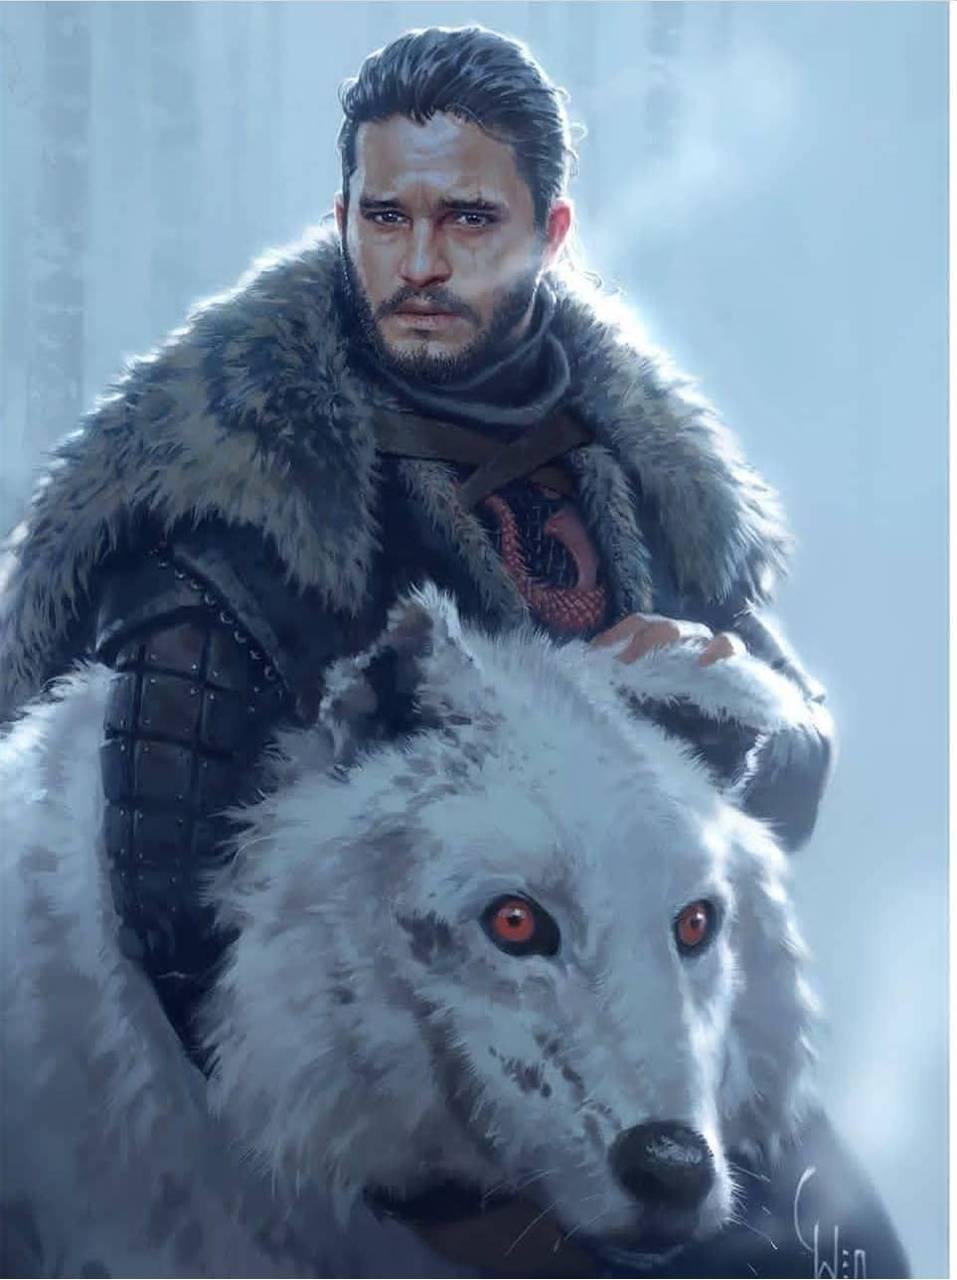 Jon Snow Wallpaper By Beautifulmemory 92 Free On Zedge